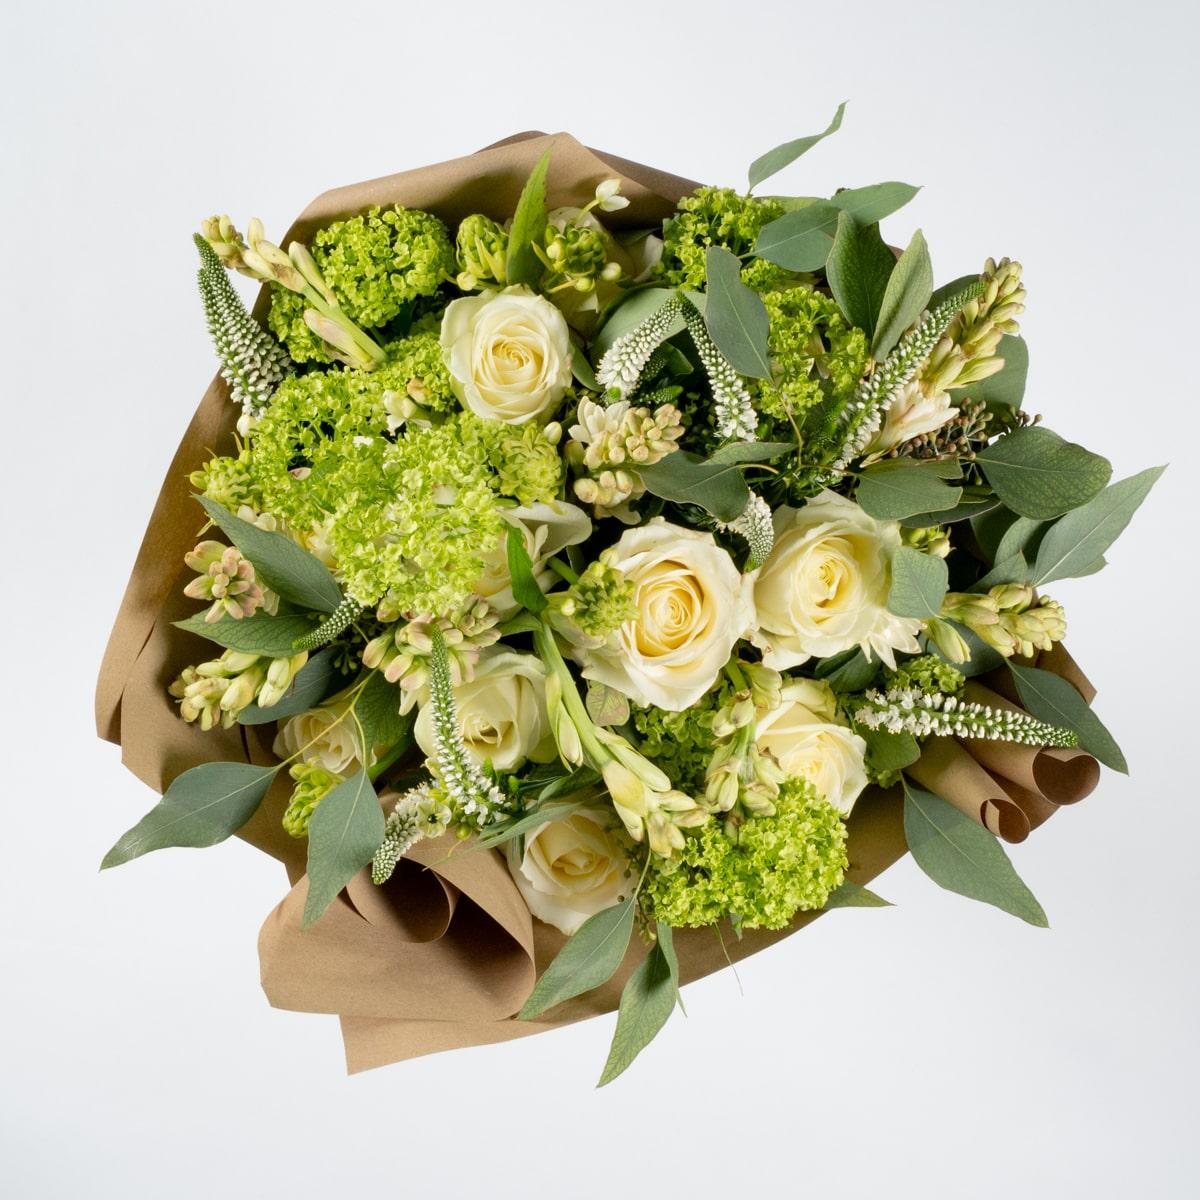 Bloom Flower Delivery | Greenwich Bouquet